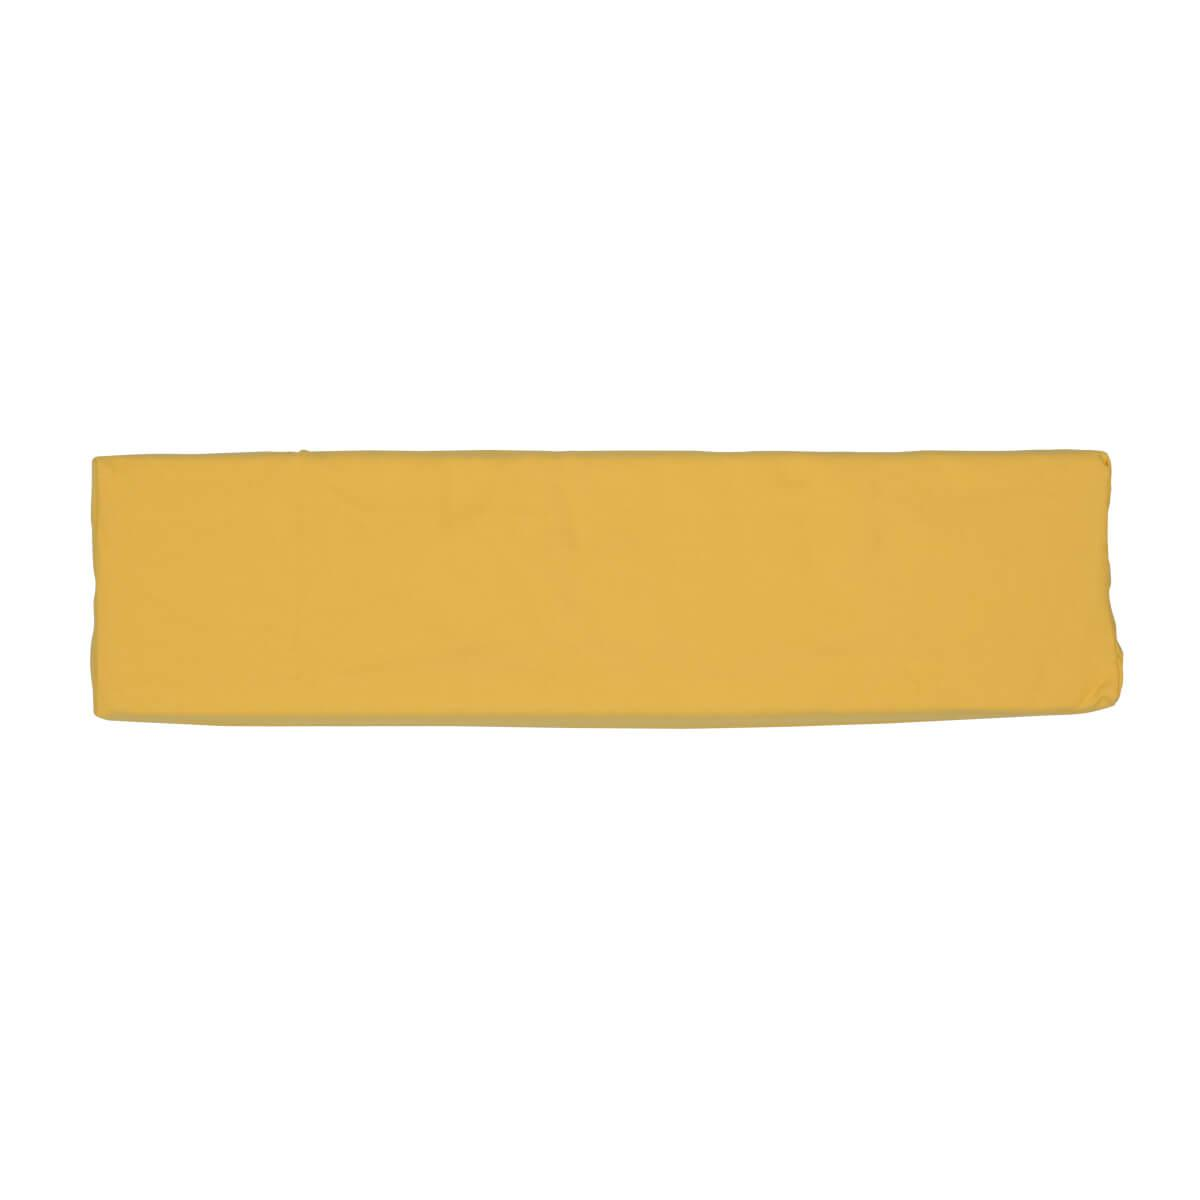 Zargenpolster DESTYLE de Breuyn gelb